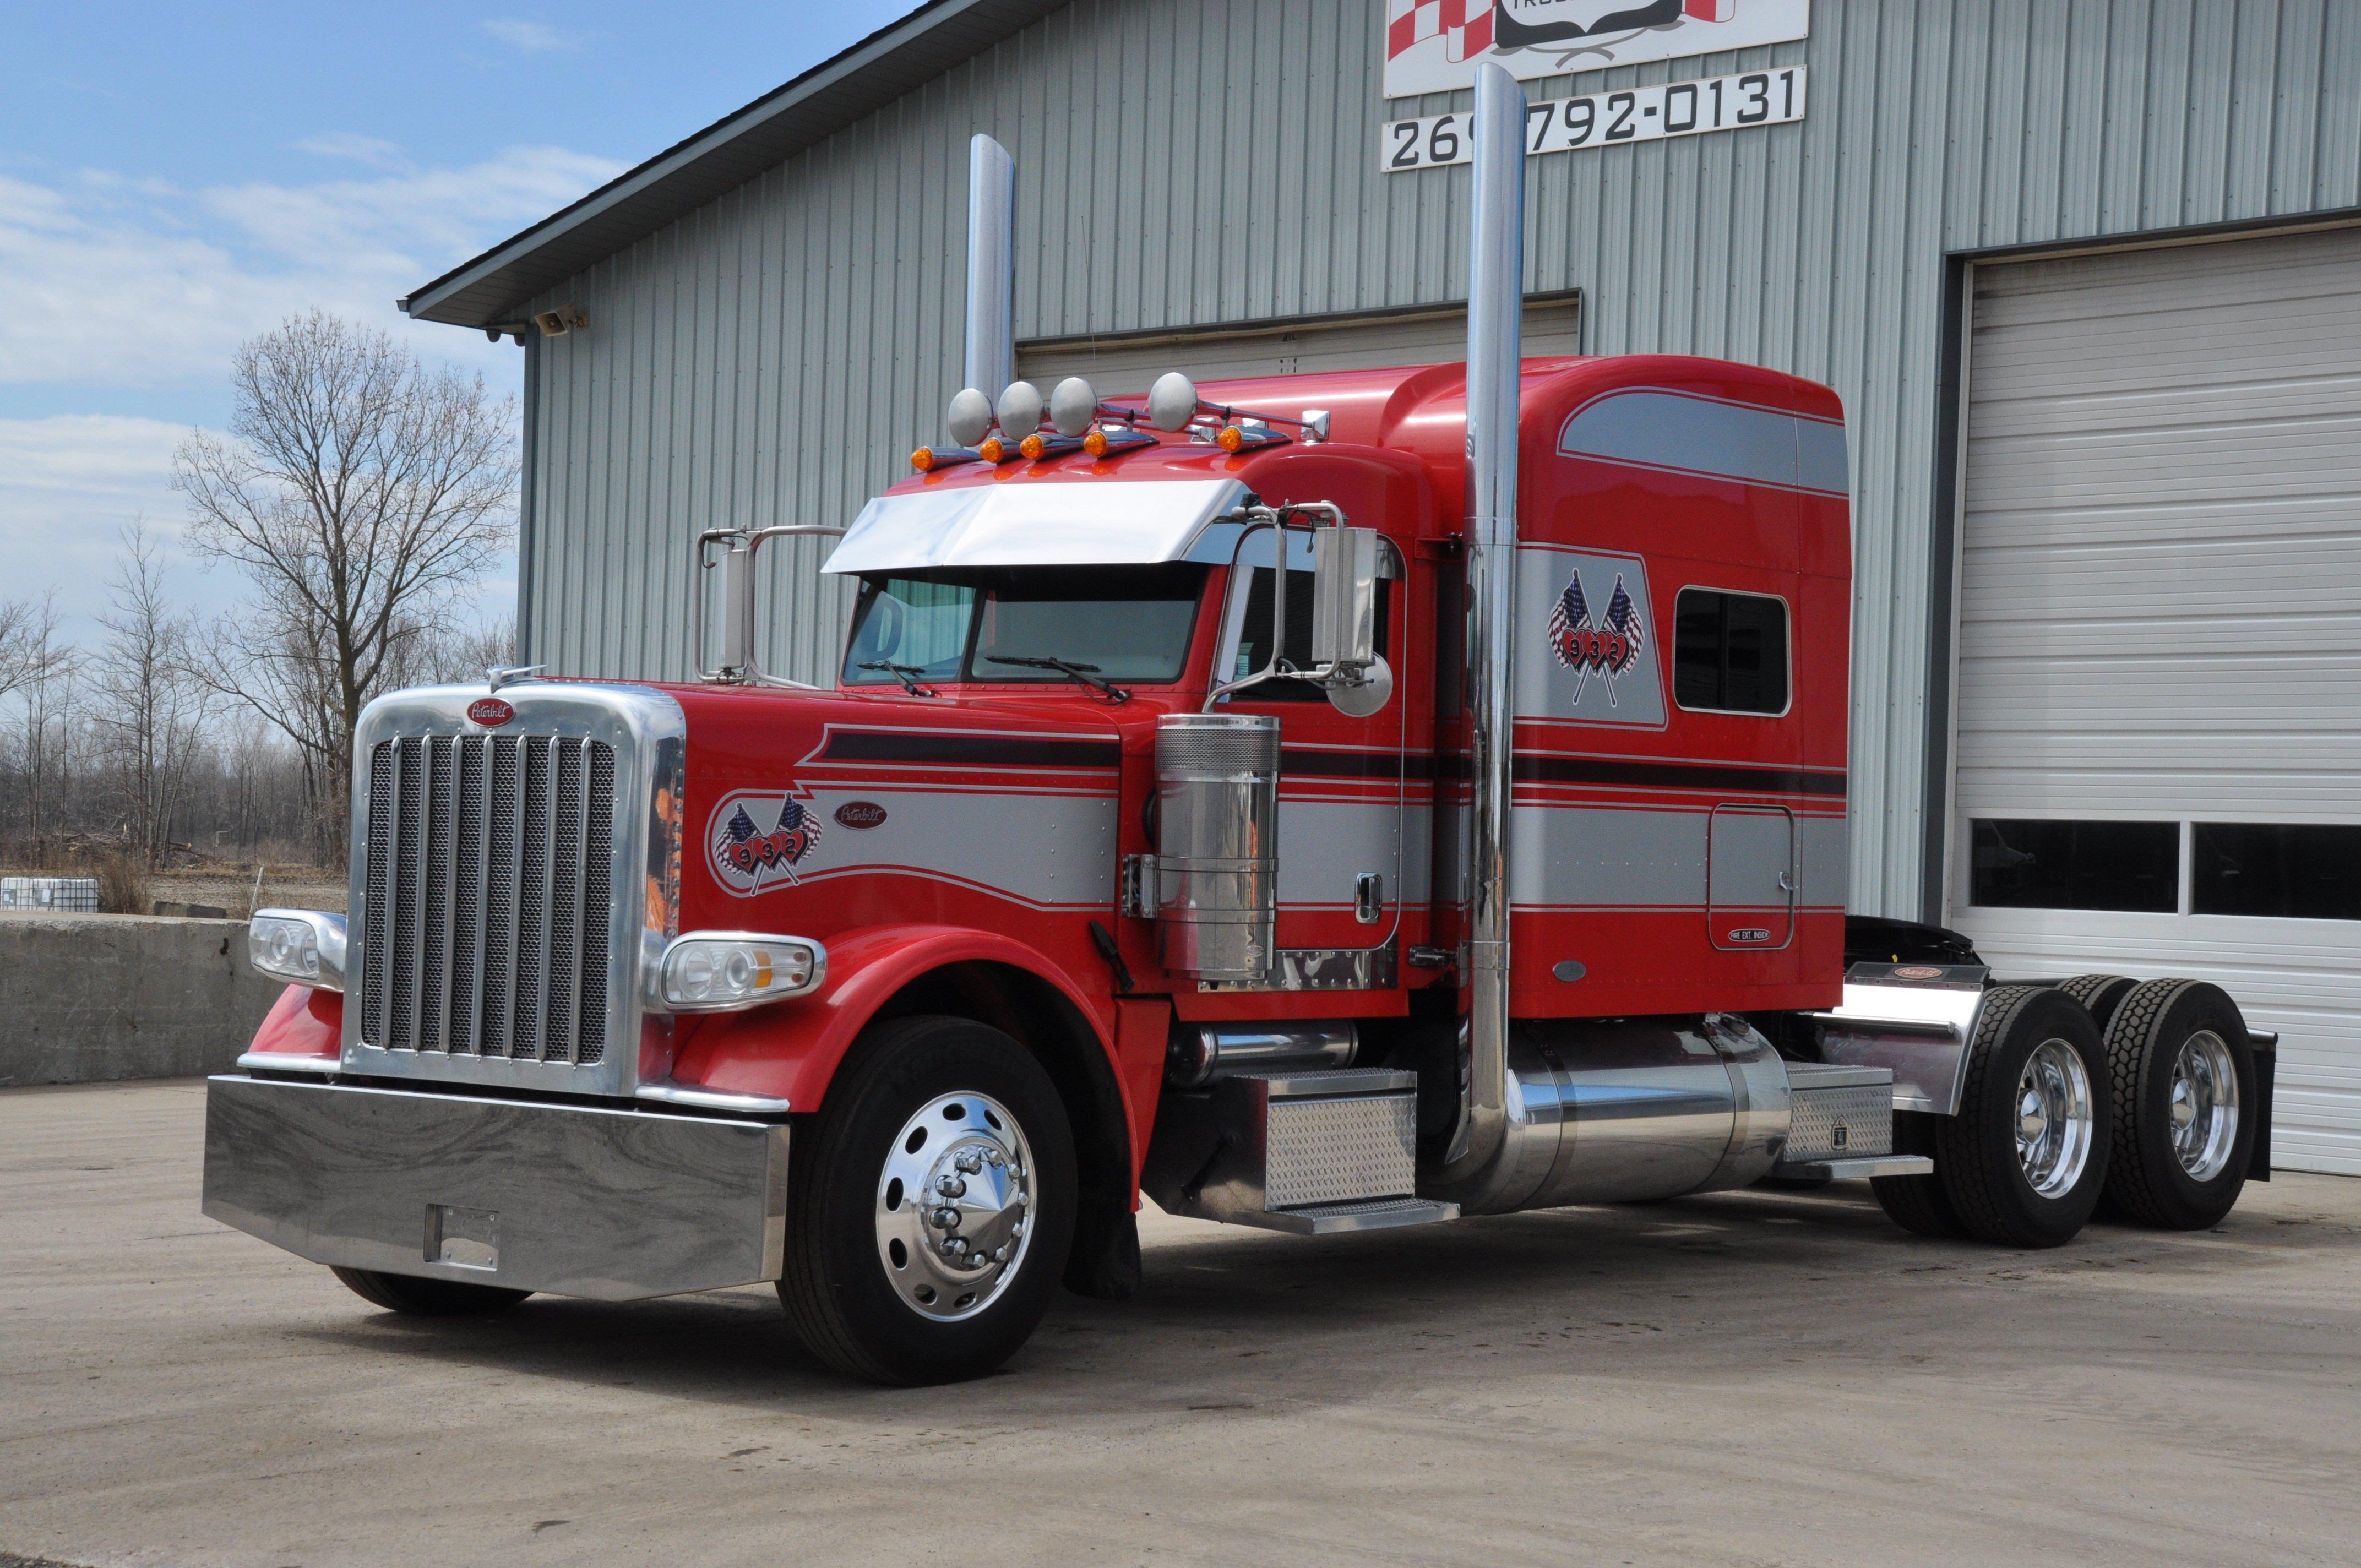 PETERBILT semi tractor transport truck wallpaper ...